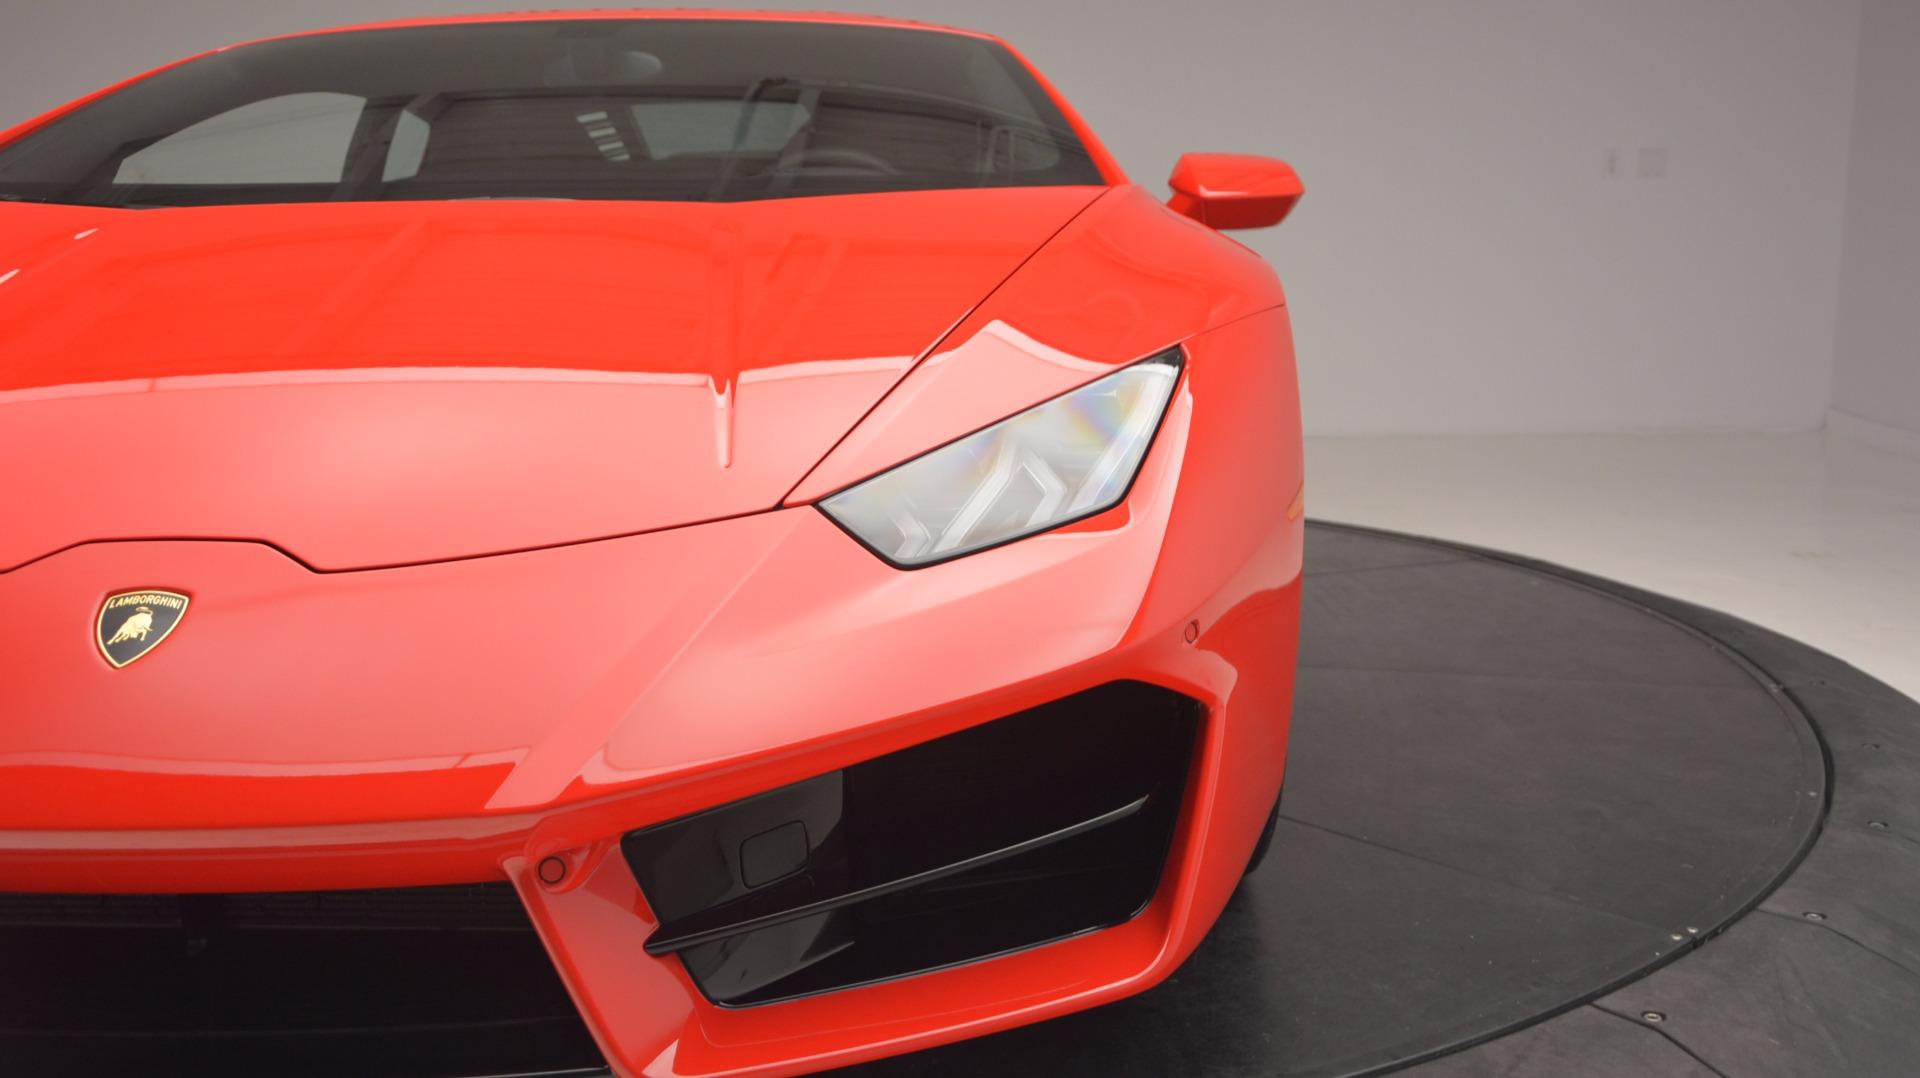 Used 2016 Lamborghini Huracan LP 580-2 For Sale In Greenwich, CT. Alfa Romeo of Greenwich, 7184 1070_p15